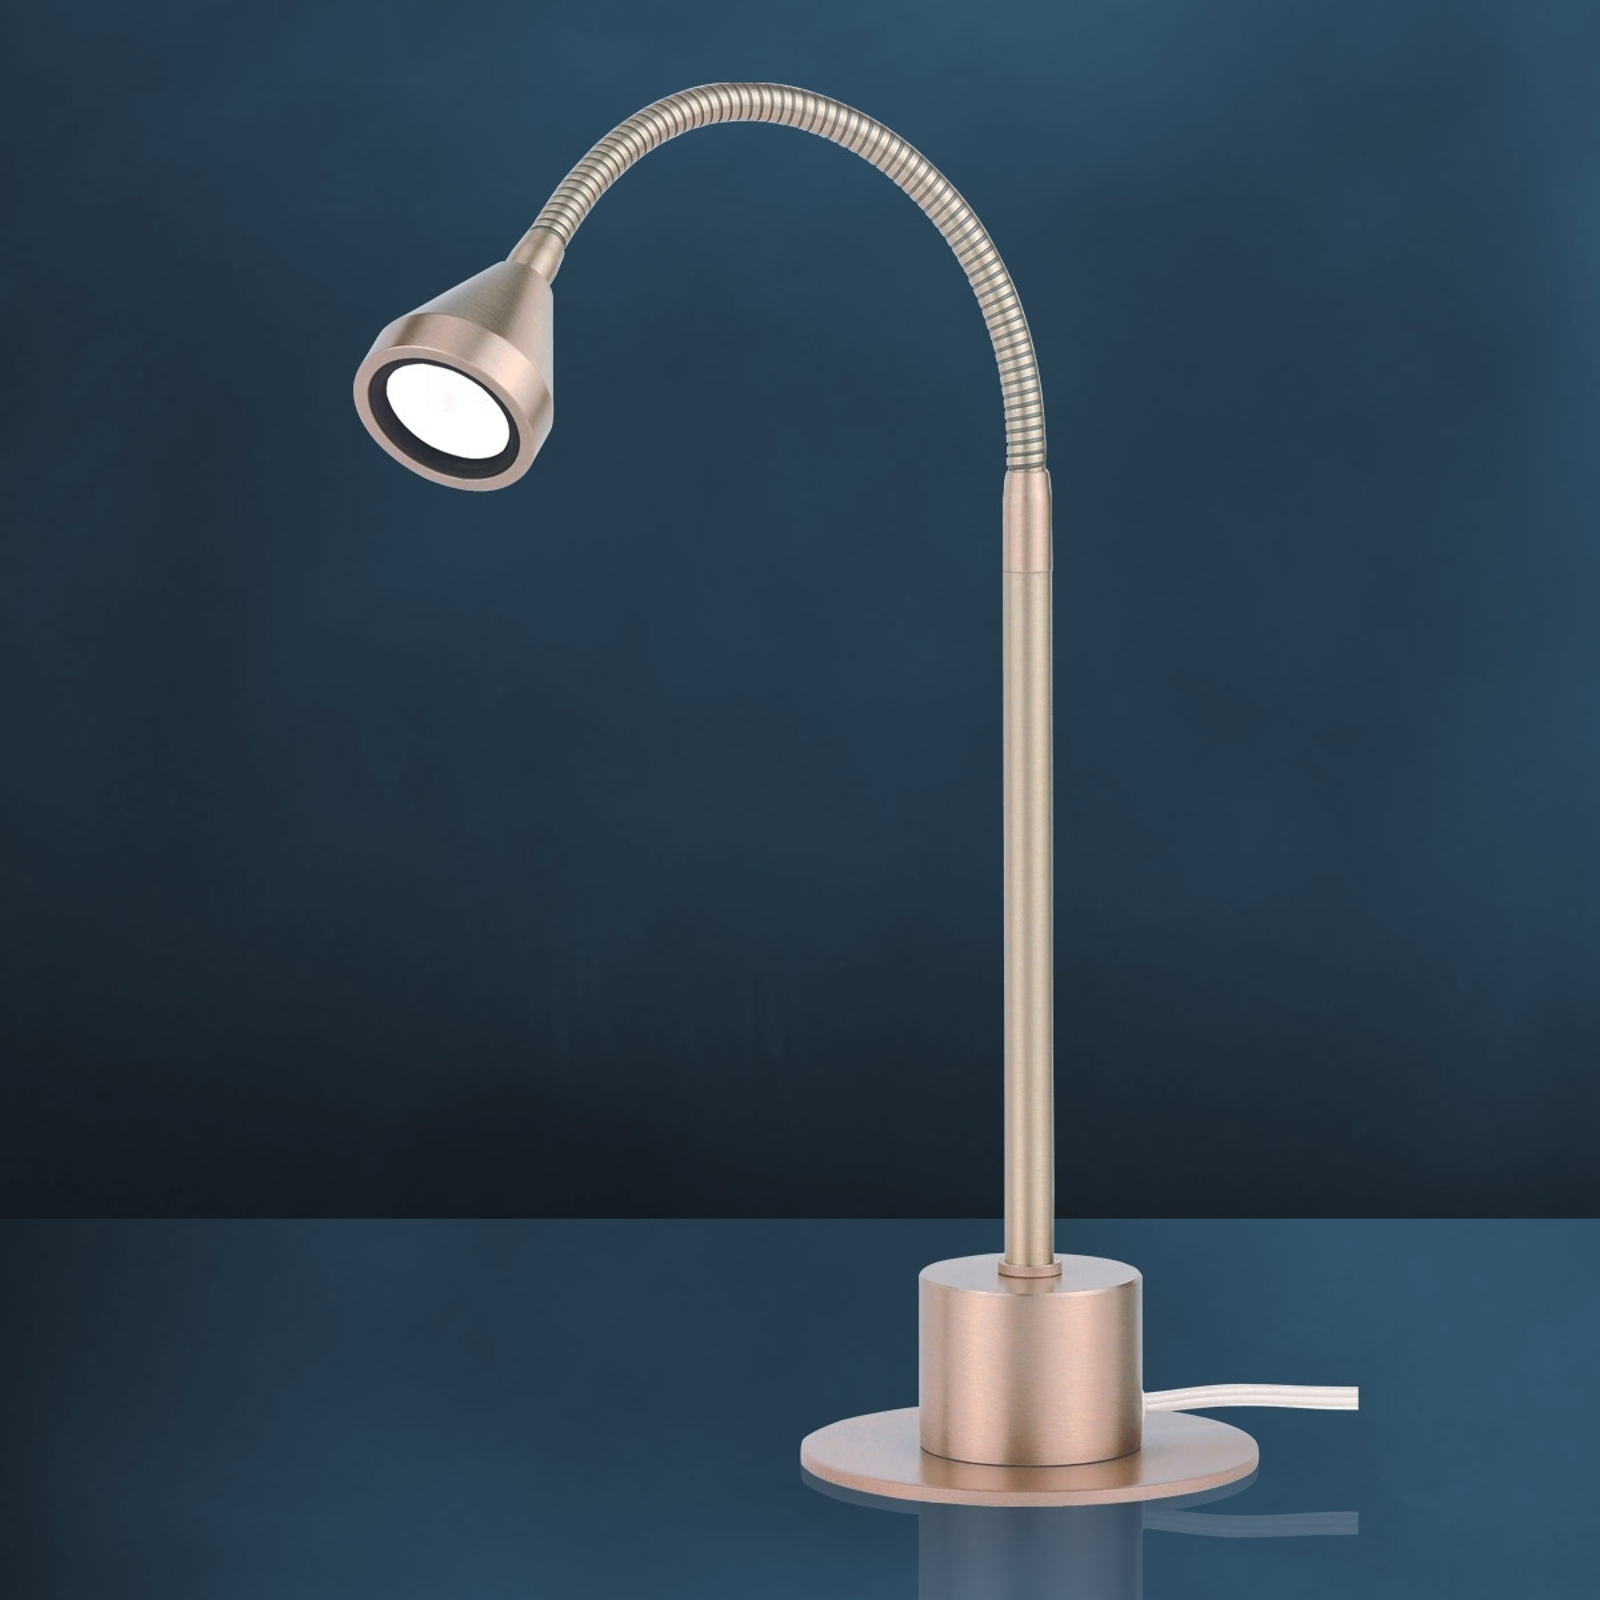 Lámpara mesa LED MINI, brazo flex blanco universal